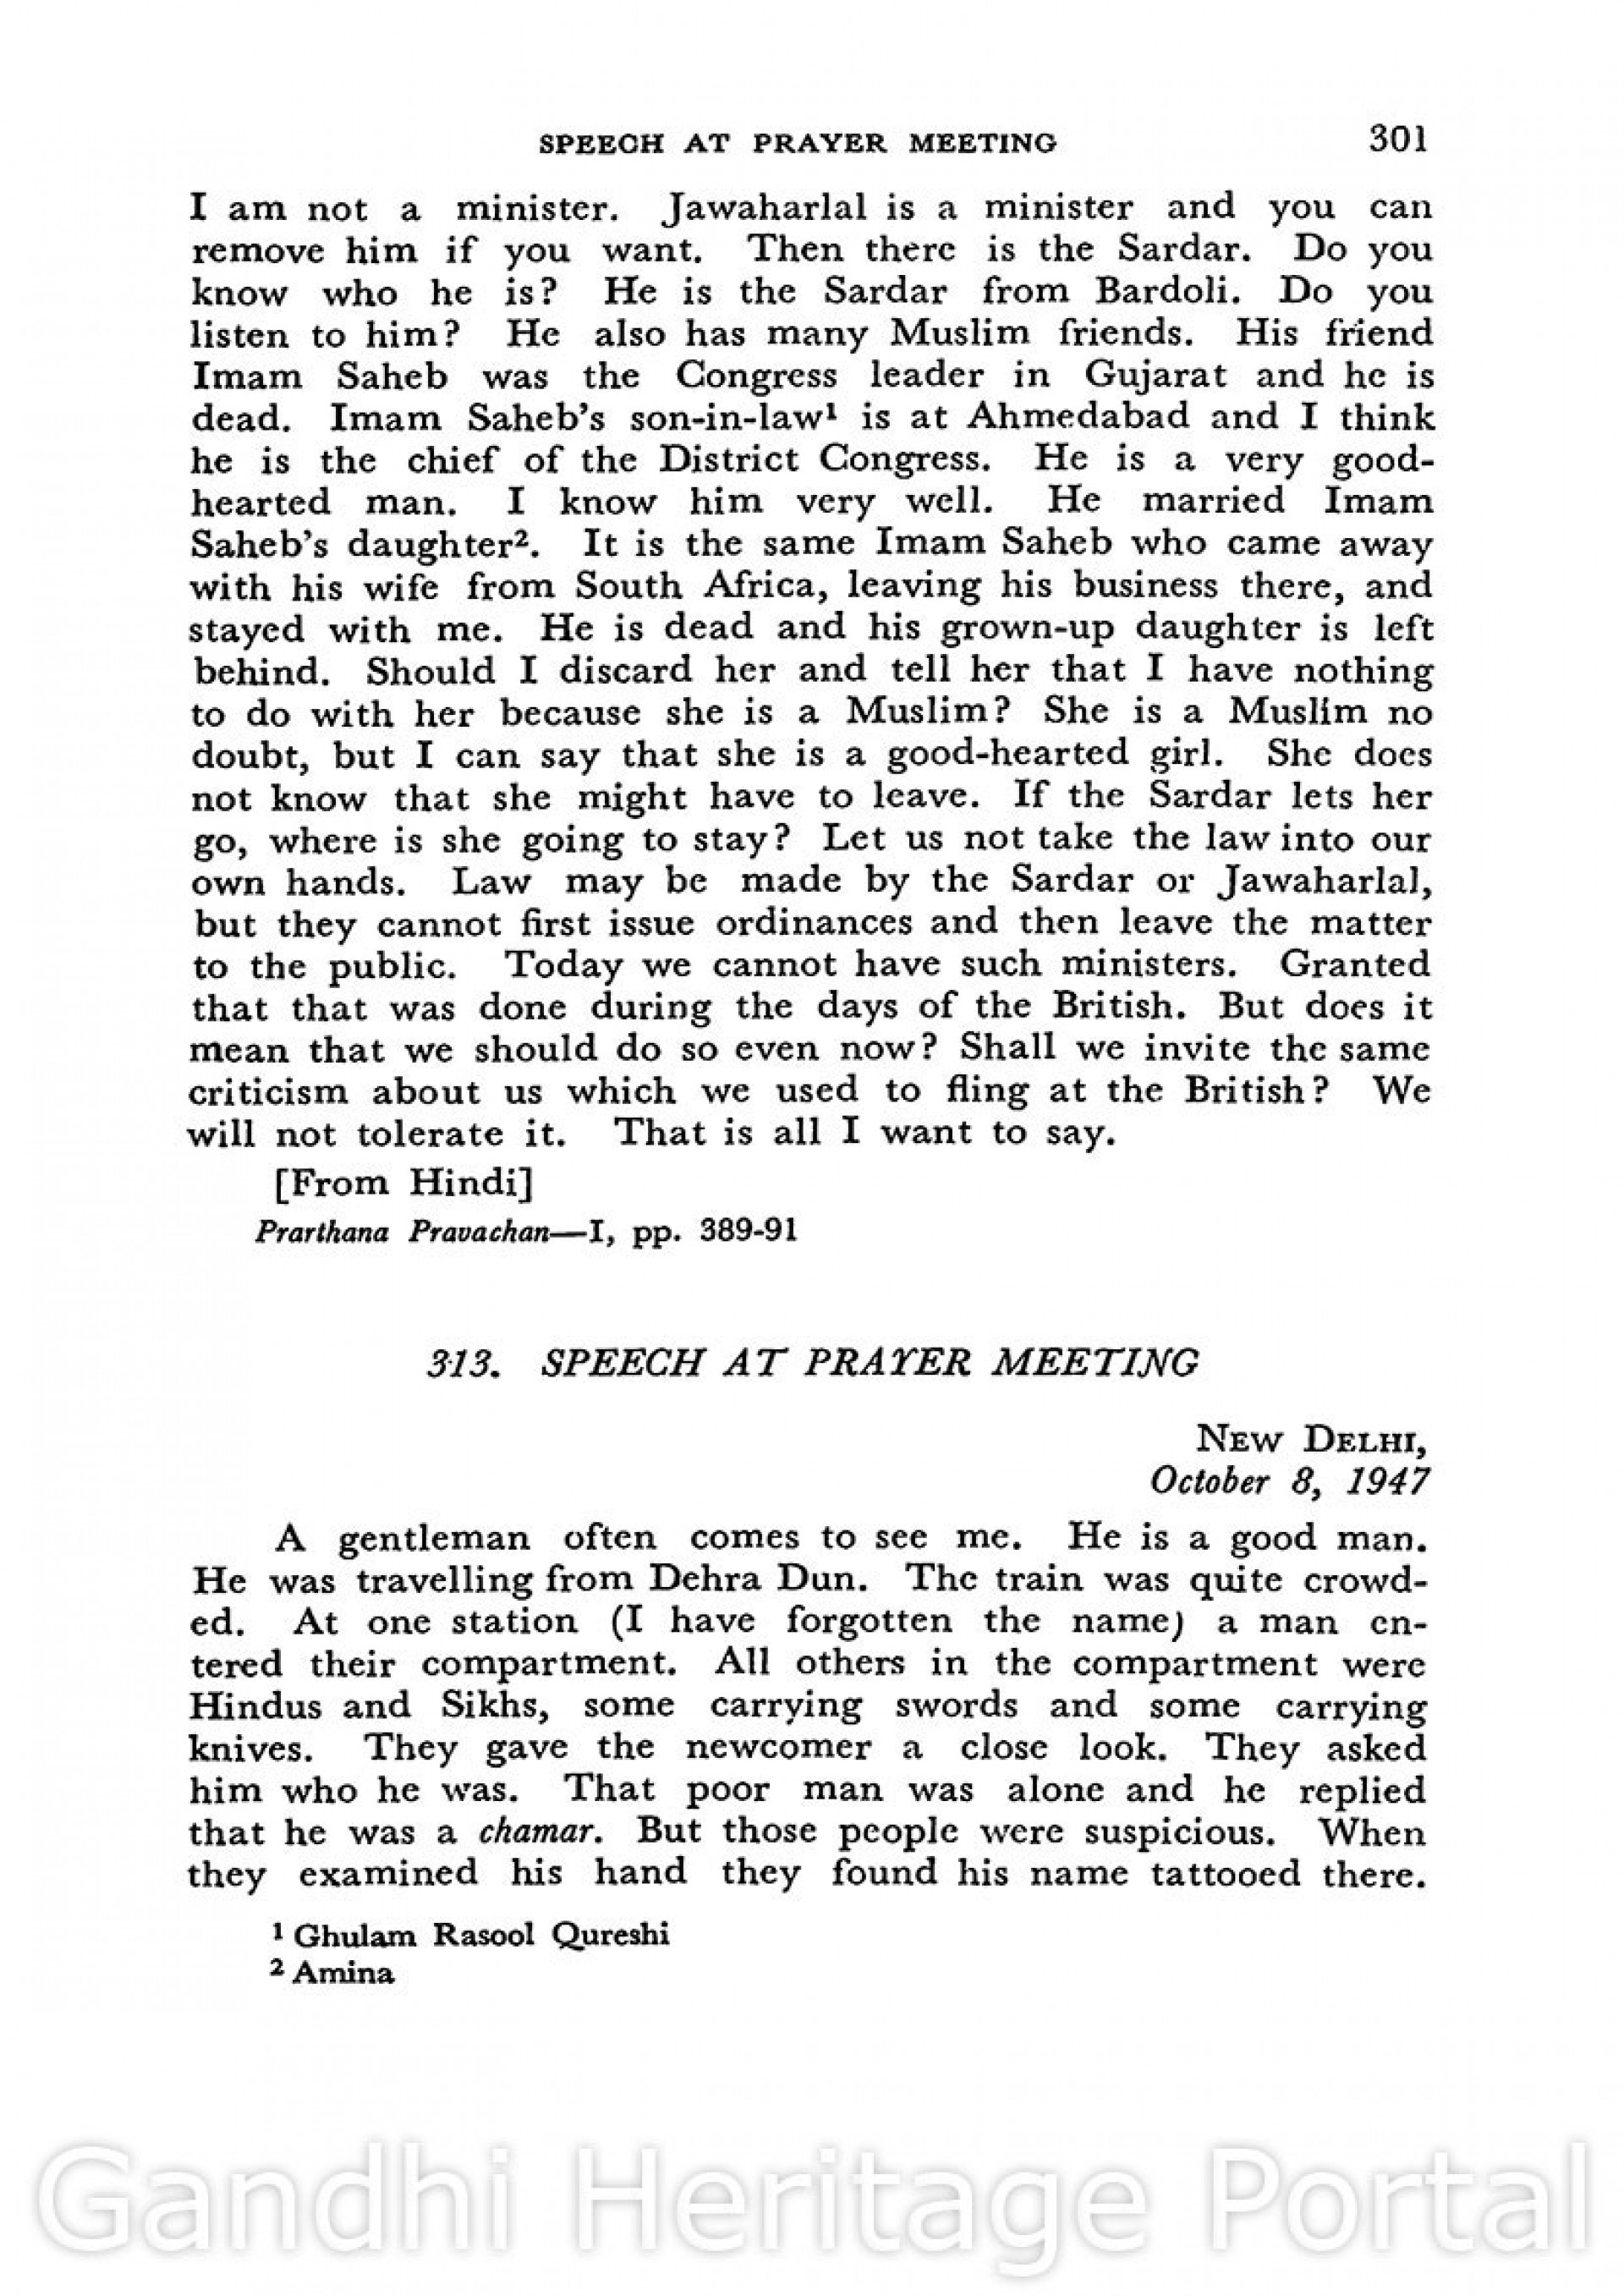 015 Essay Example Mahatma Gandhi In English Jayanti L Magnificent Conclusion 1000 Words Pdf Hindi 5 Lines 1920